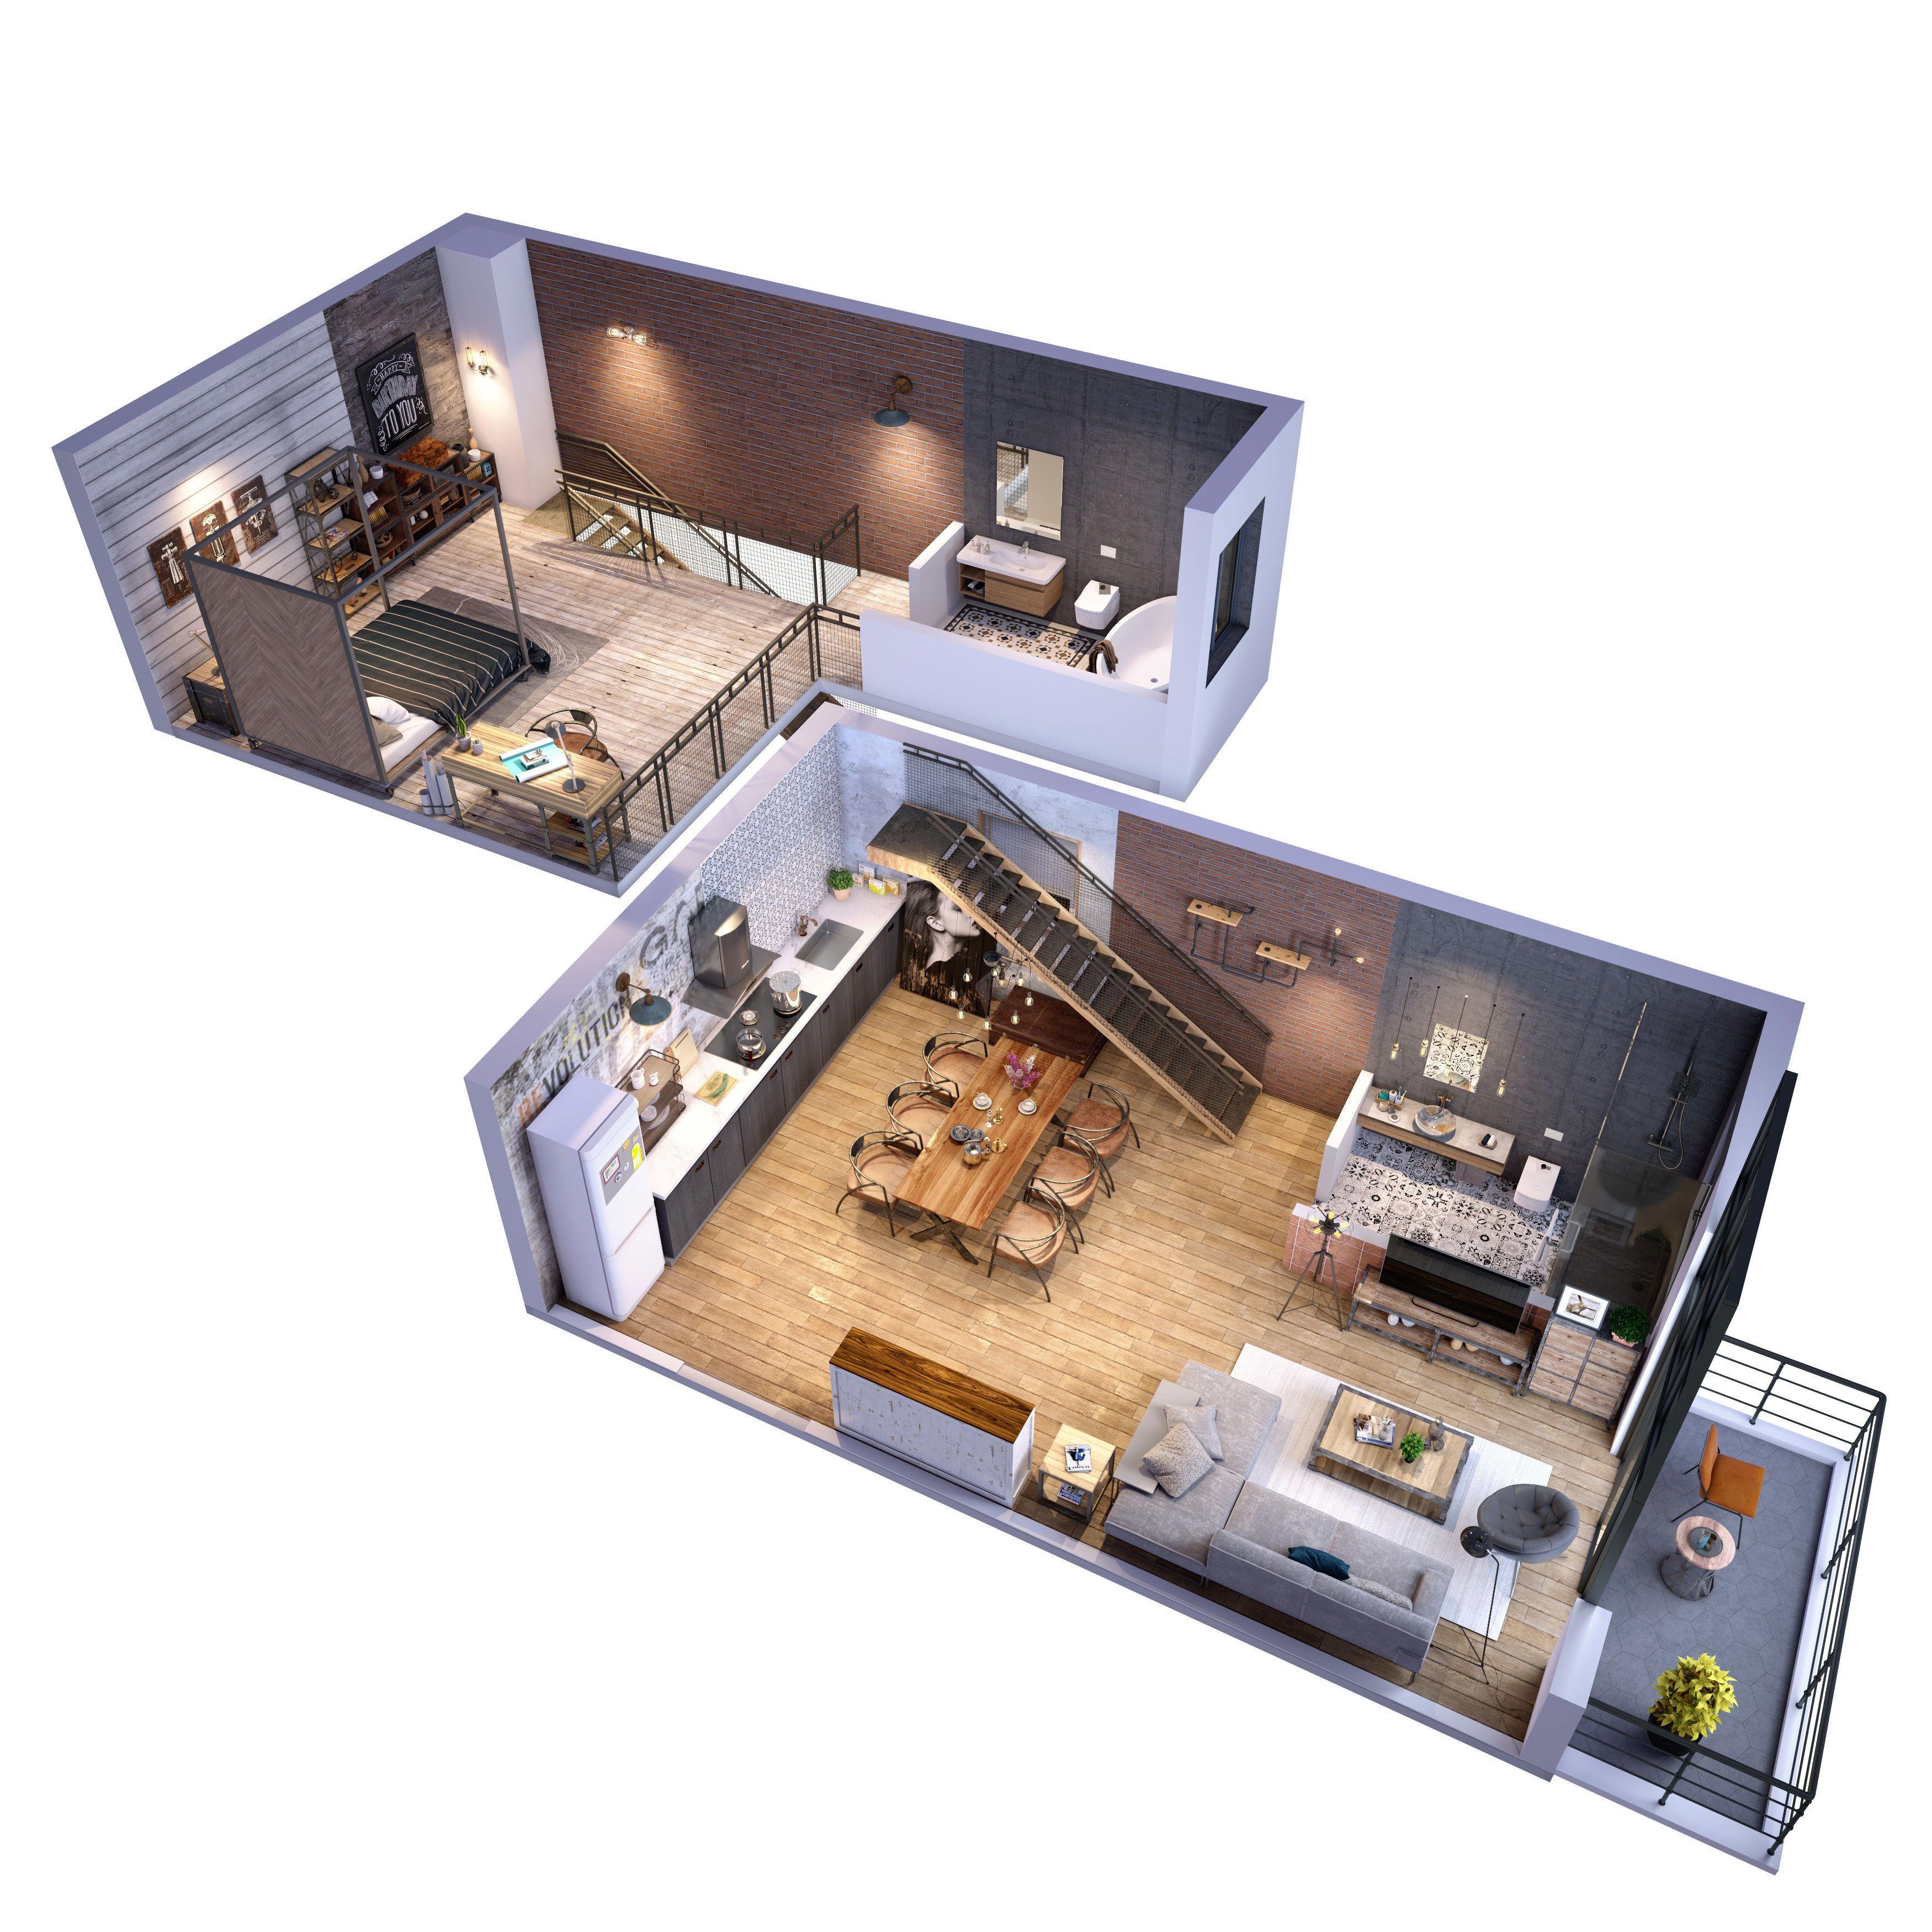 Loft Apartment 3d Model Cgtrader Small Apartment Design Loft Apartment Apartment Architecture